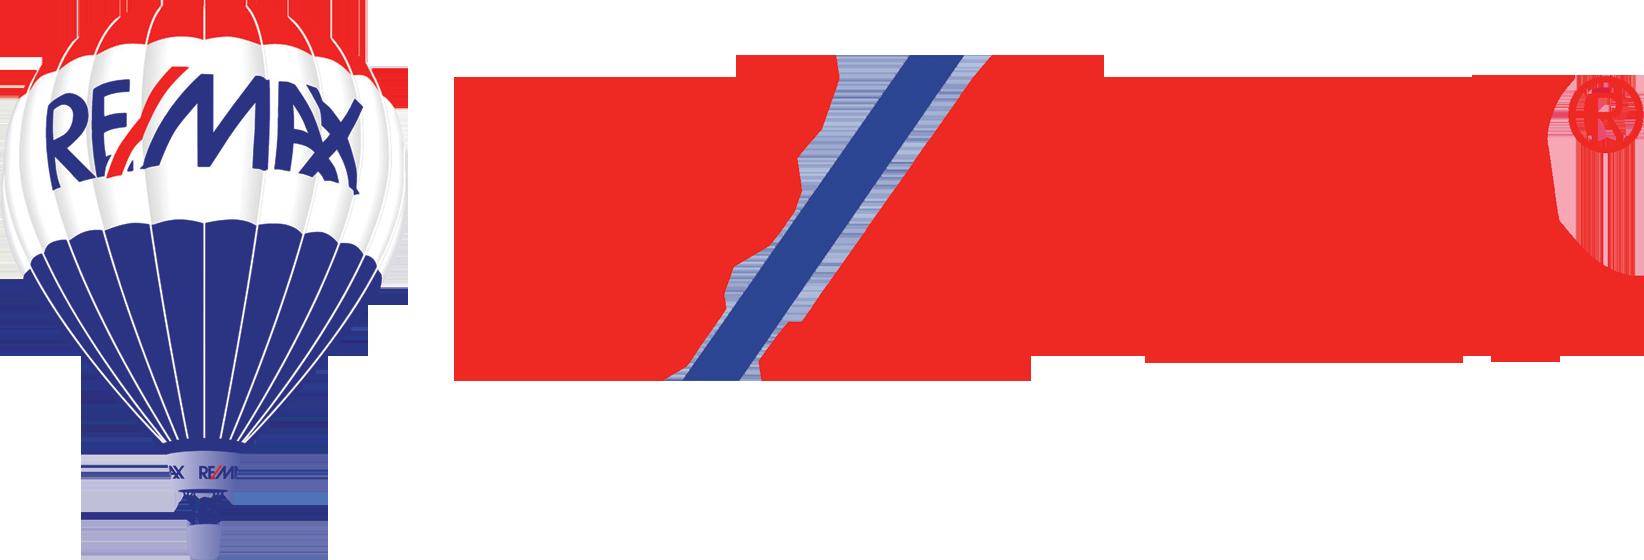 Virtual Access Tours - Remax